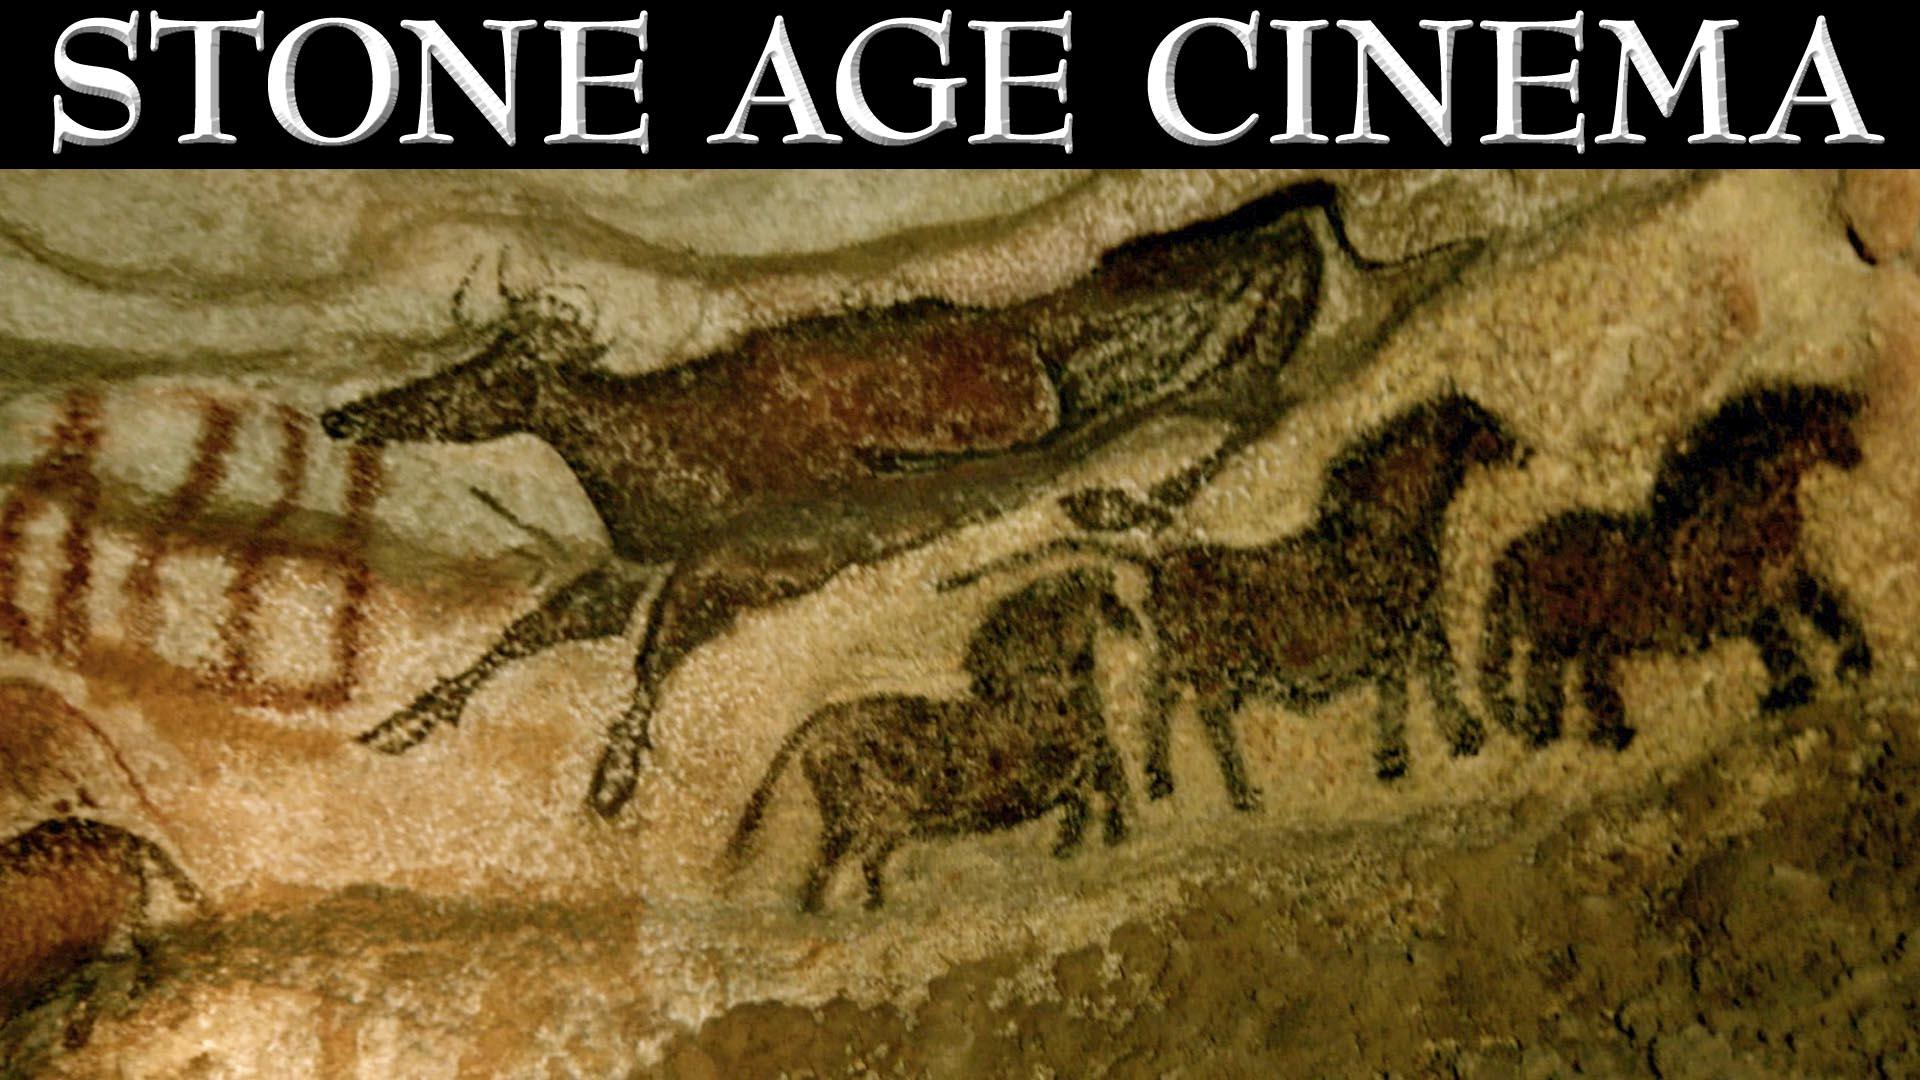 Stone Age Cinema